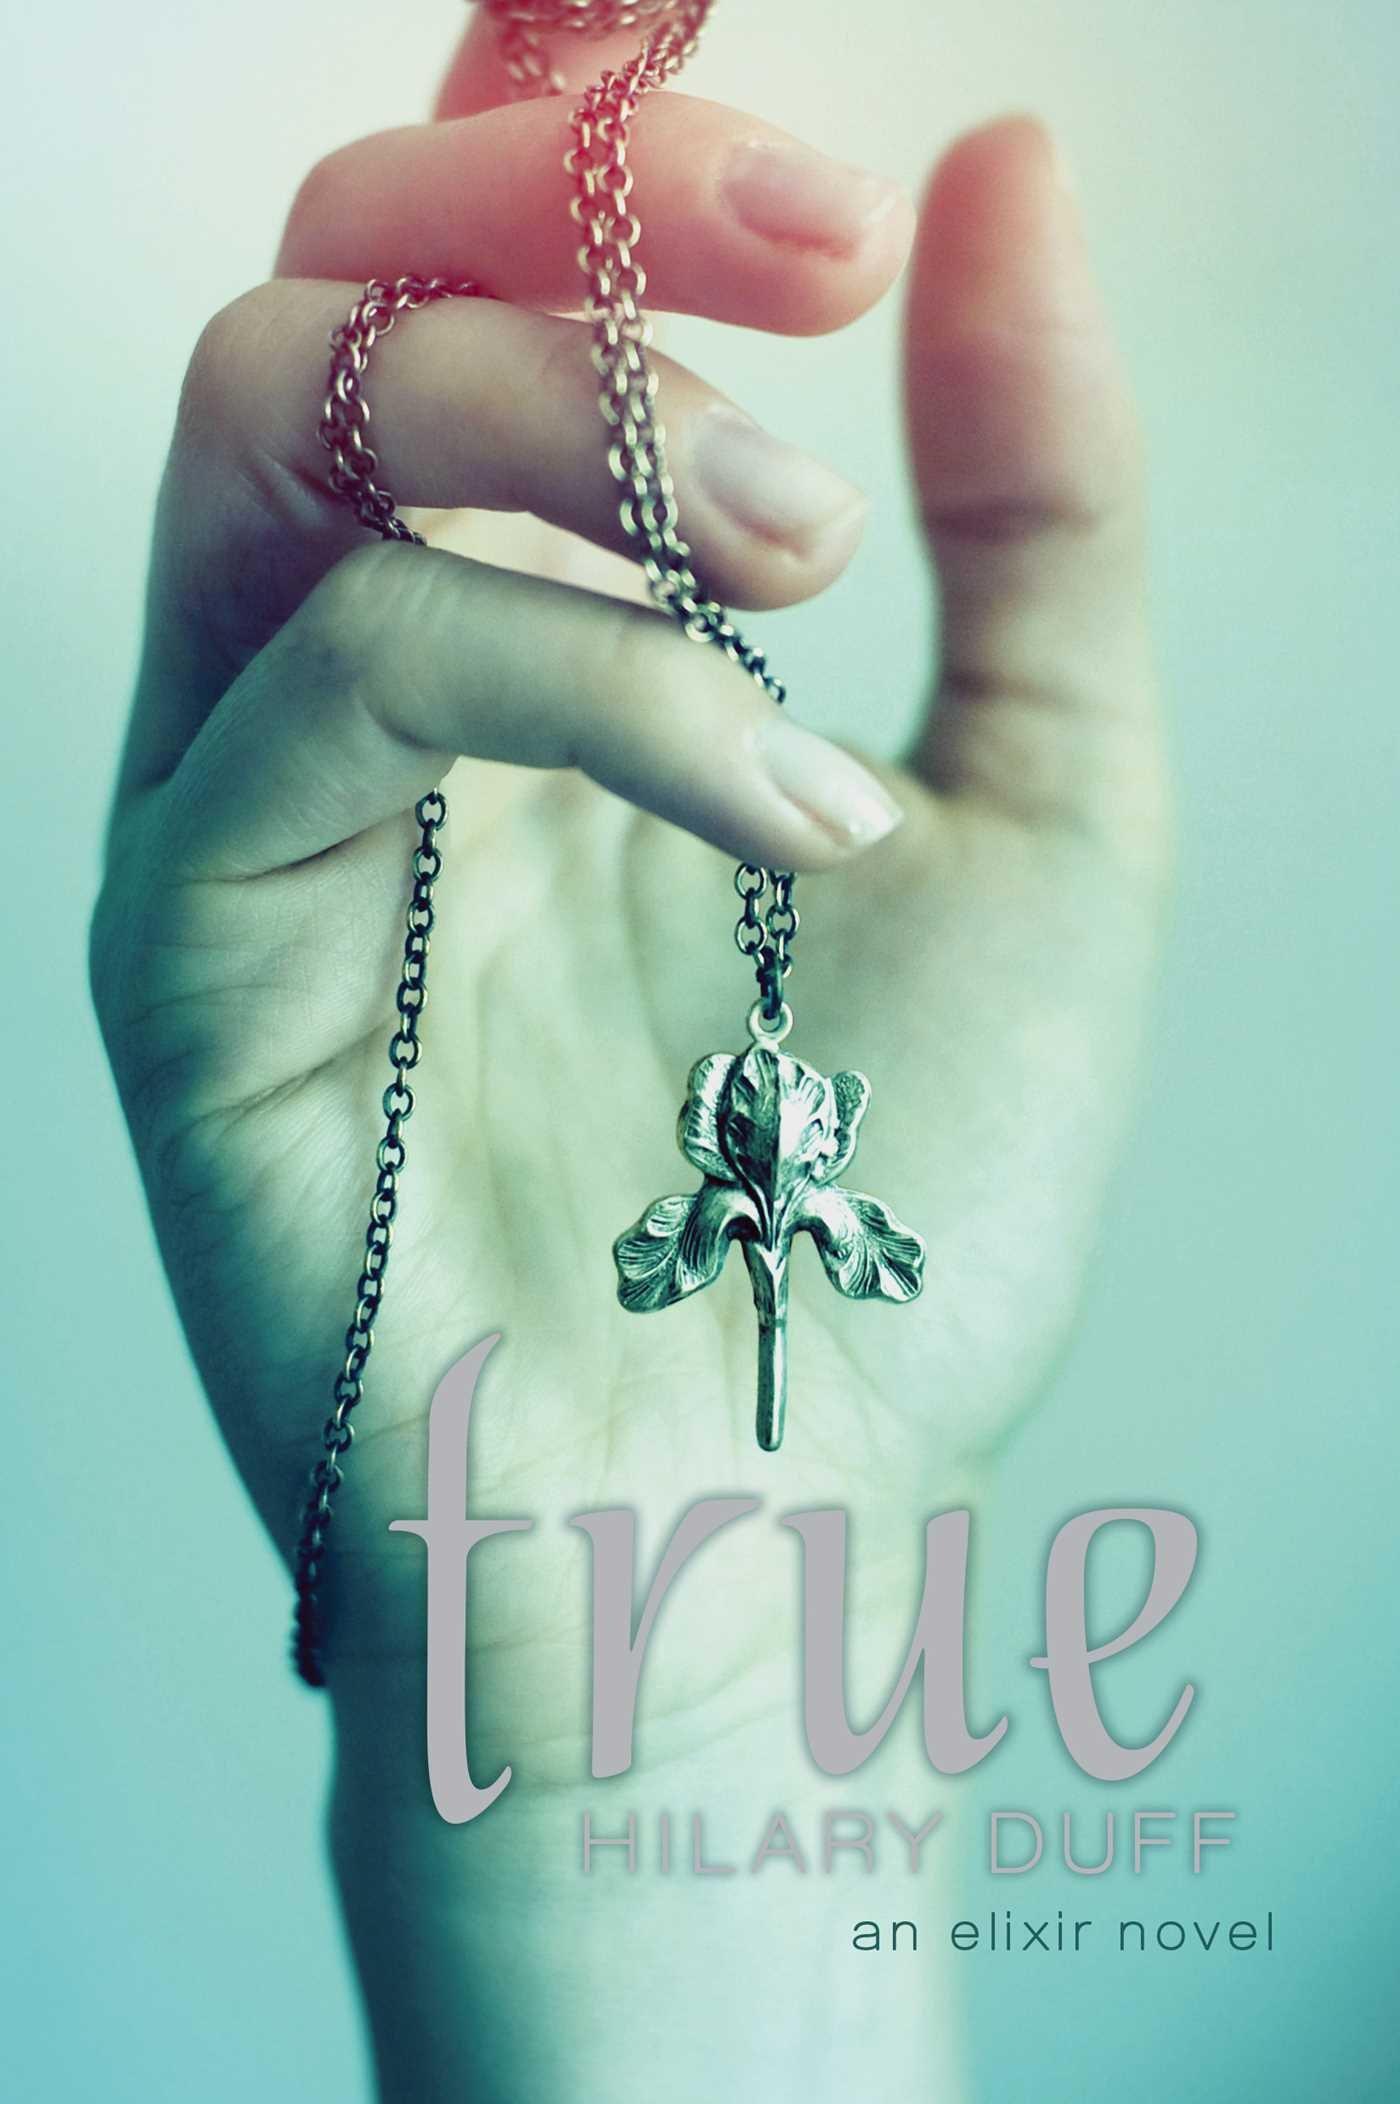 True Elixir Novel Hilary Duff product image